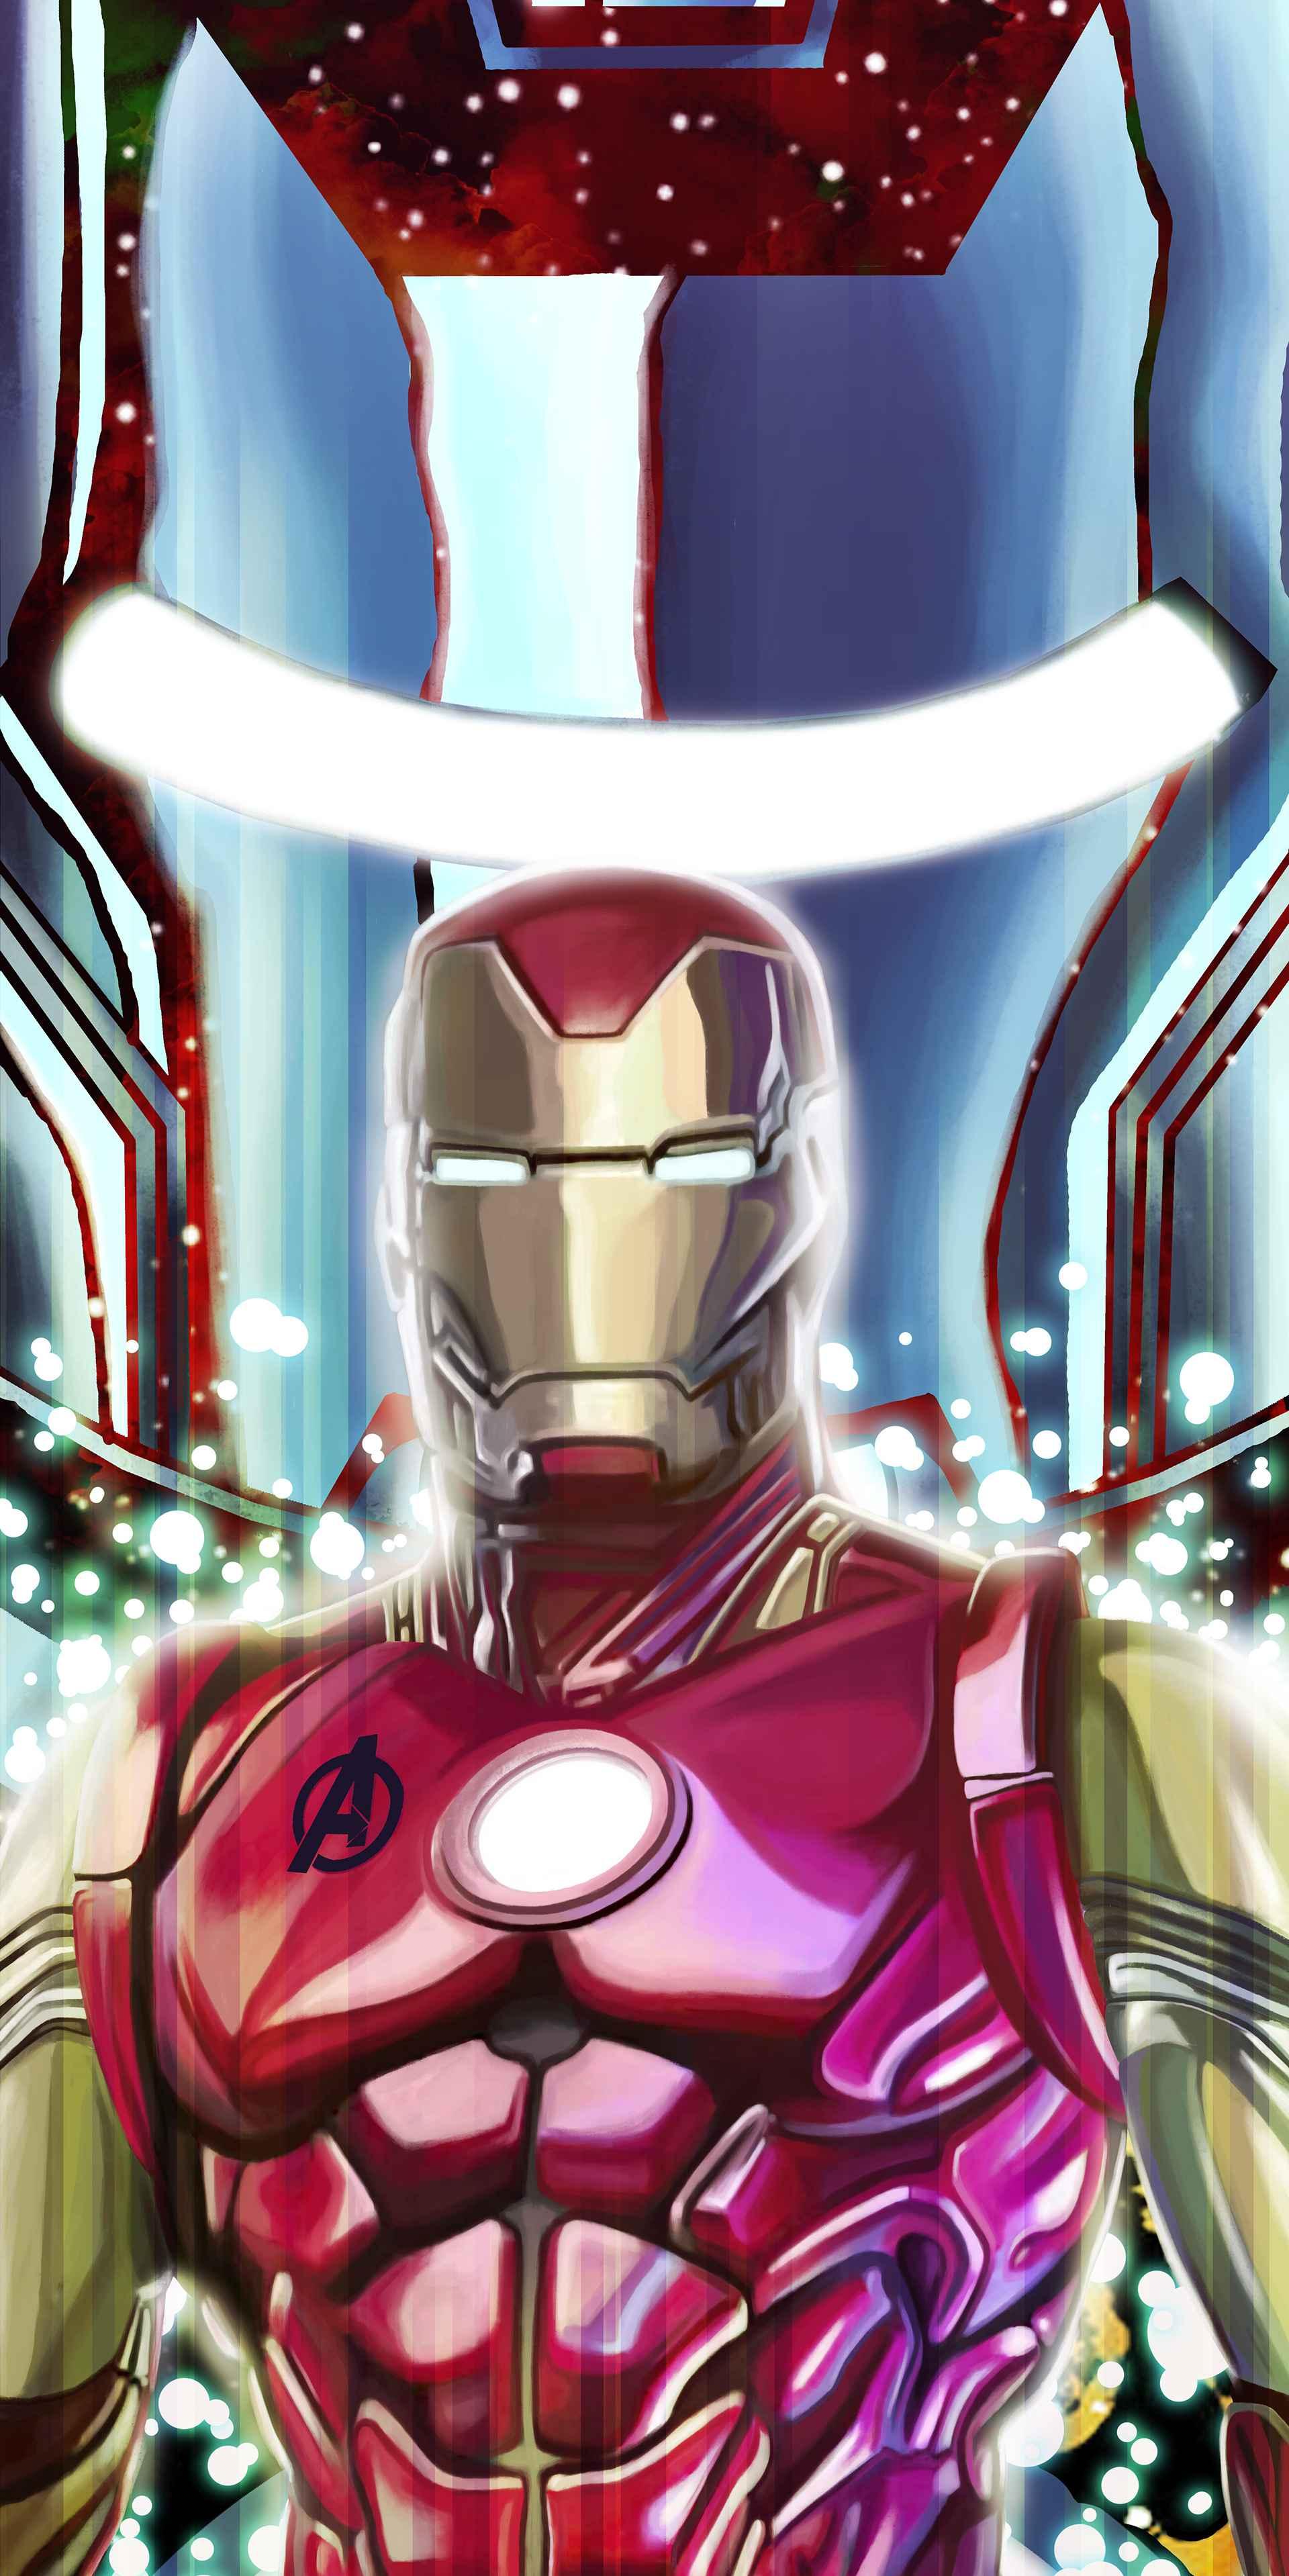 Animal Man Wallpaper Iron Man Mark 85 Armor Art Iphone Wallpaper Iphone